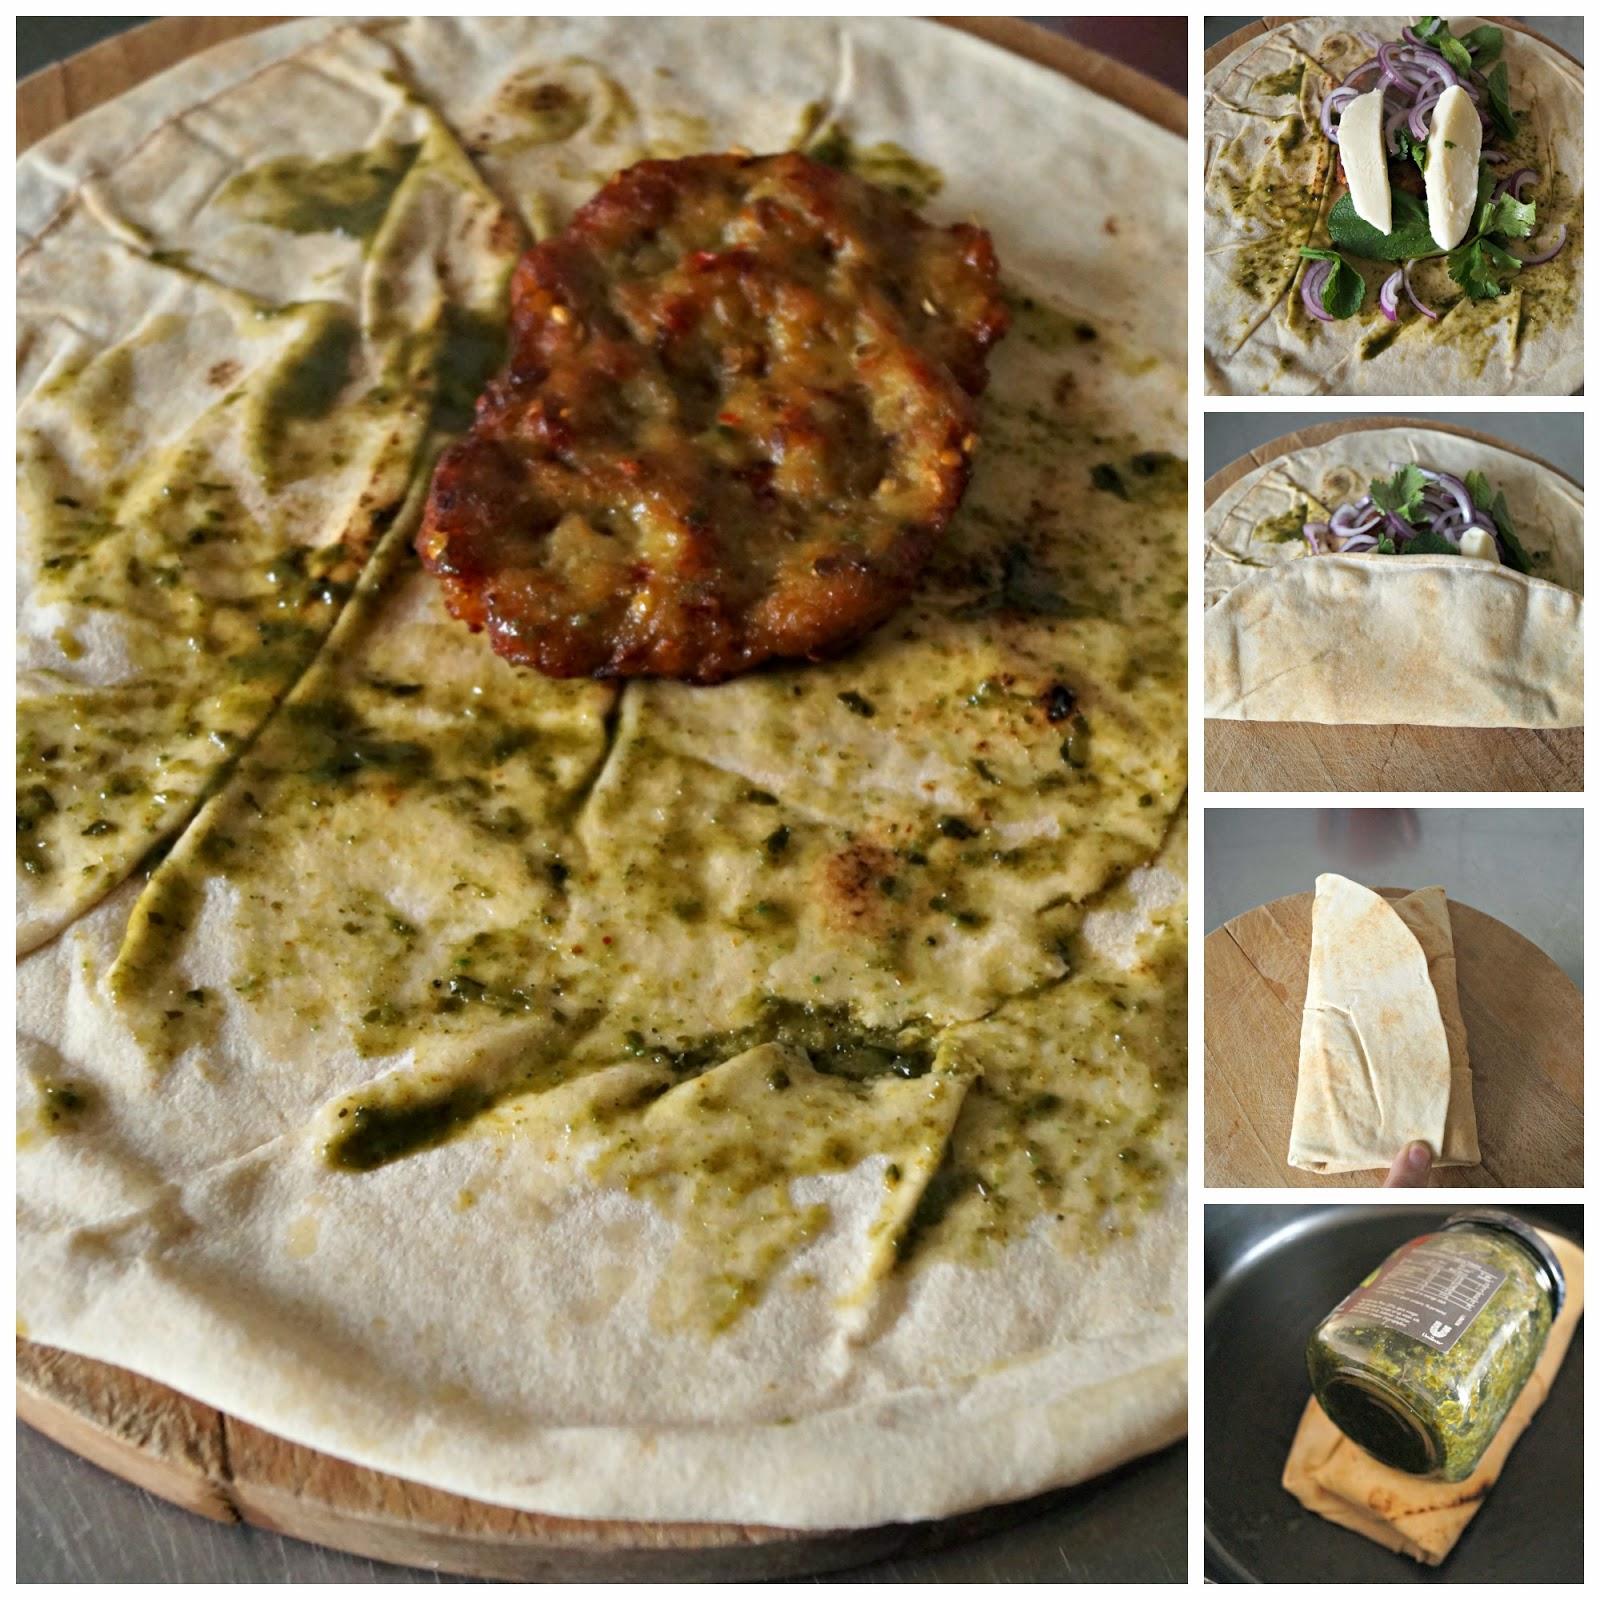 http://cupcakeluvs.blogspot.dk/2015/03/kebab-wraps.html